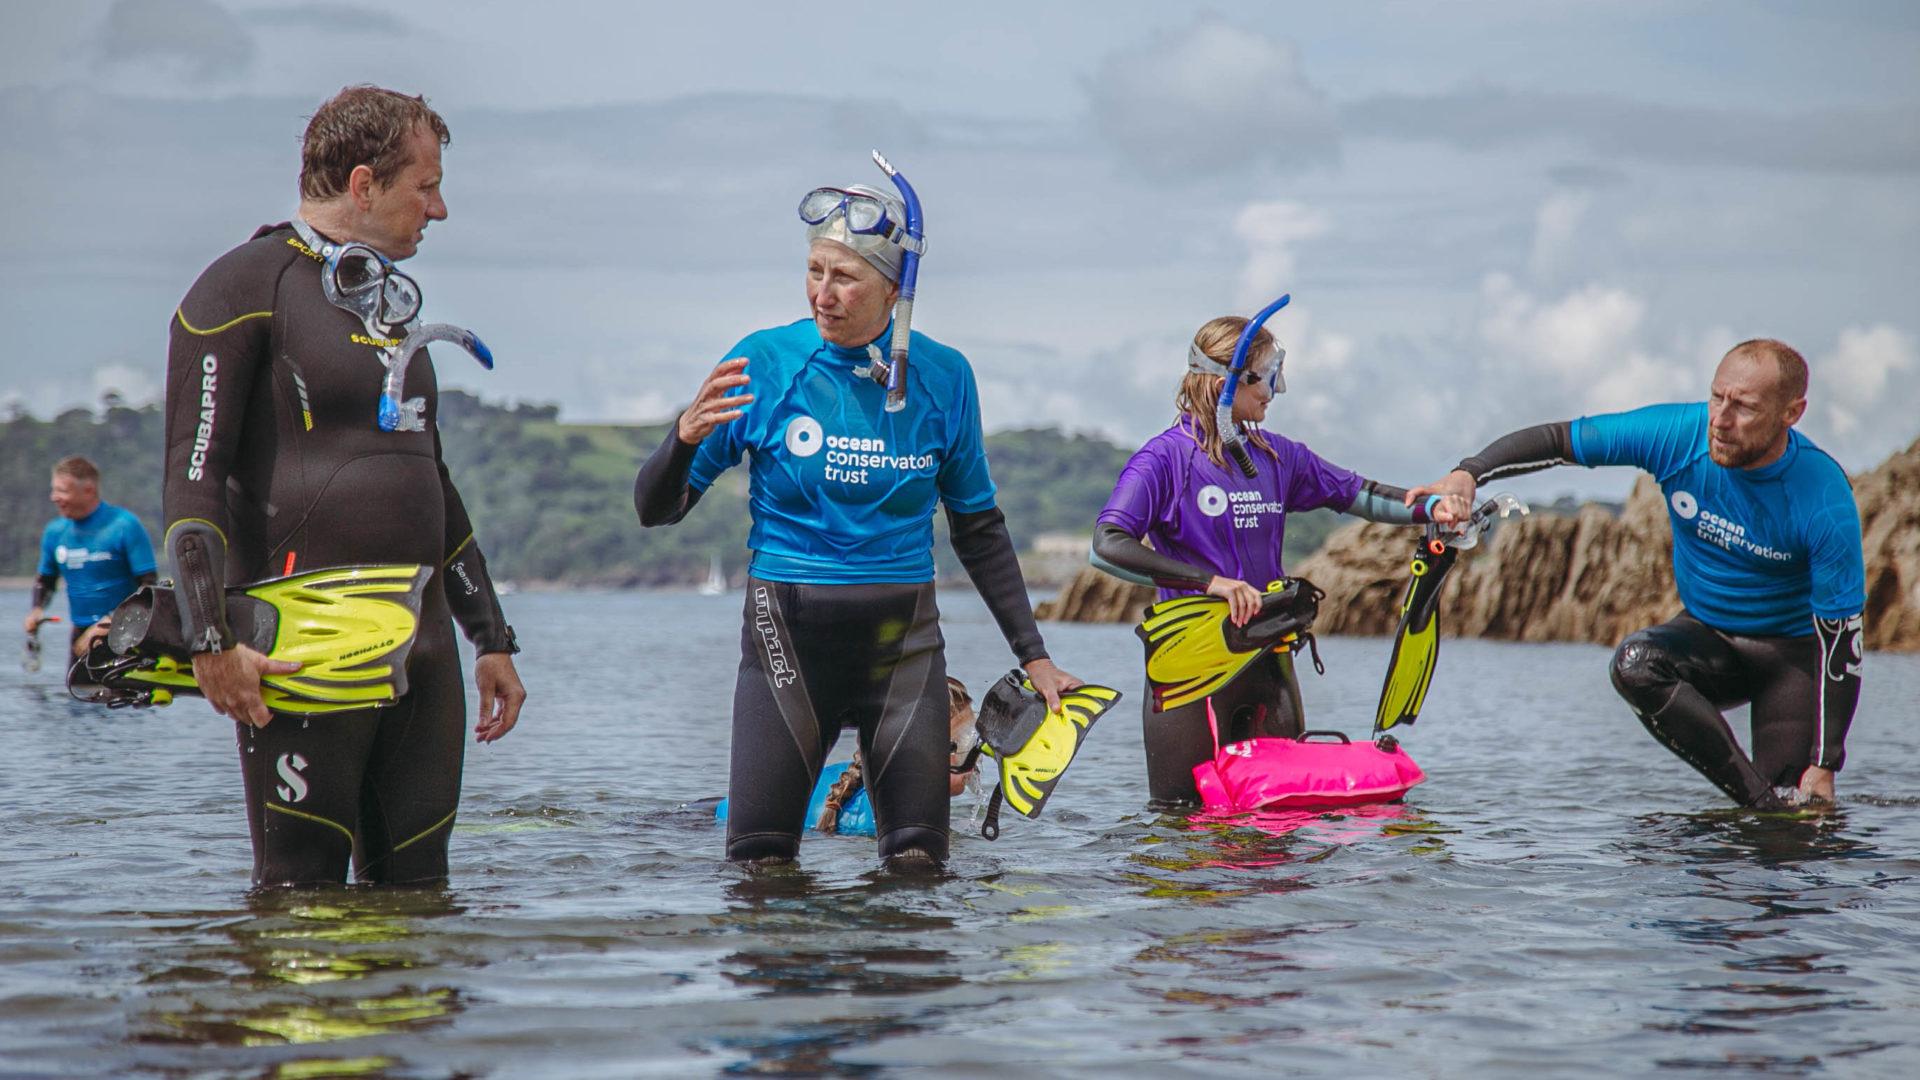 ocean snorkel safari in plymouth sound national marine park